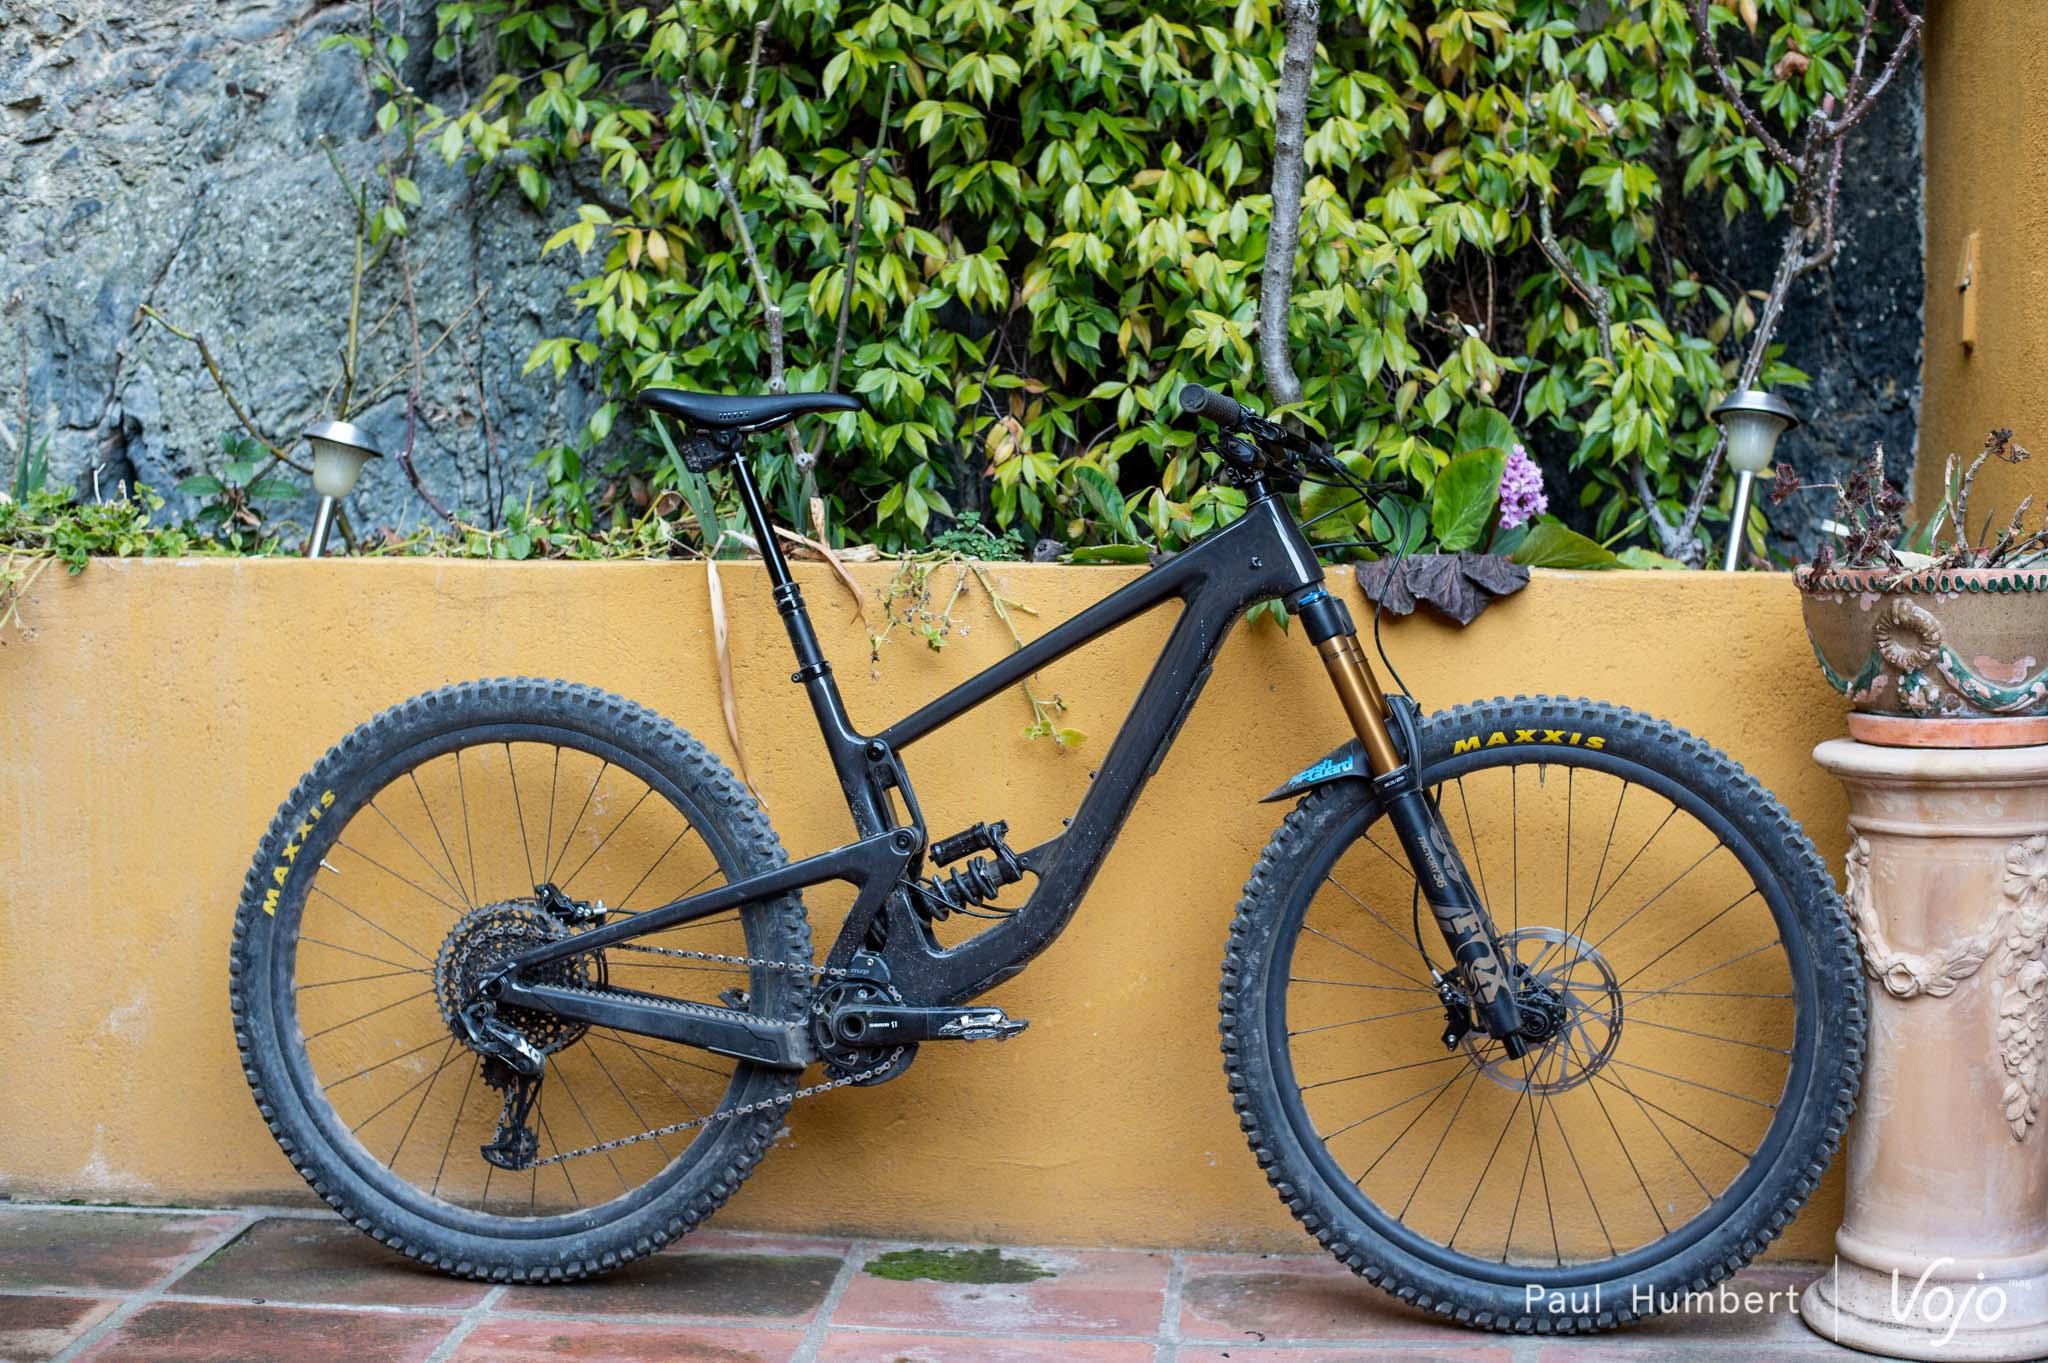 The Best Downhill Mountain Bikes For Freeride Mounta